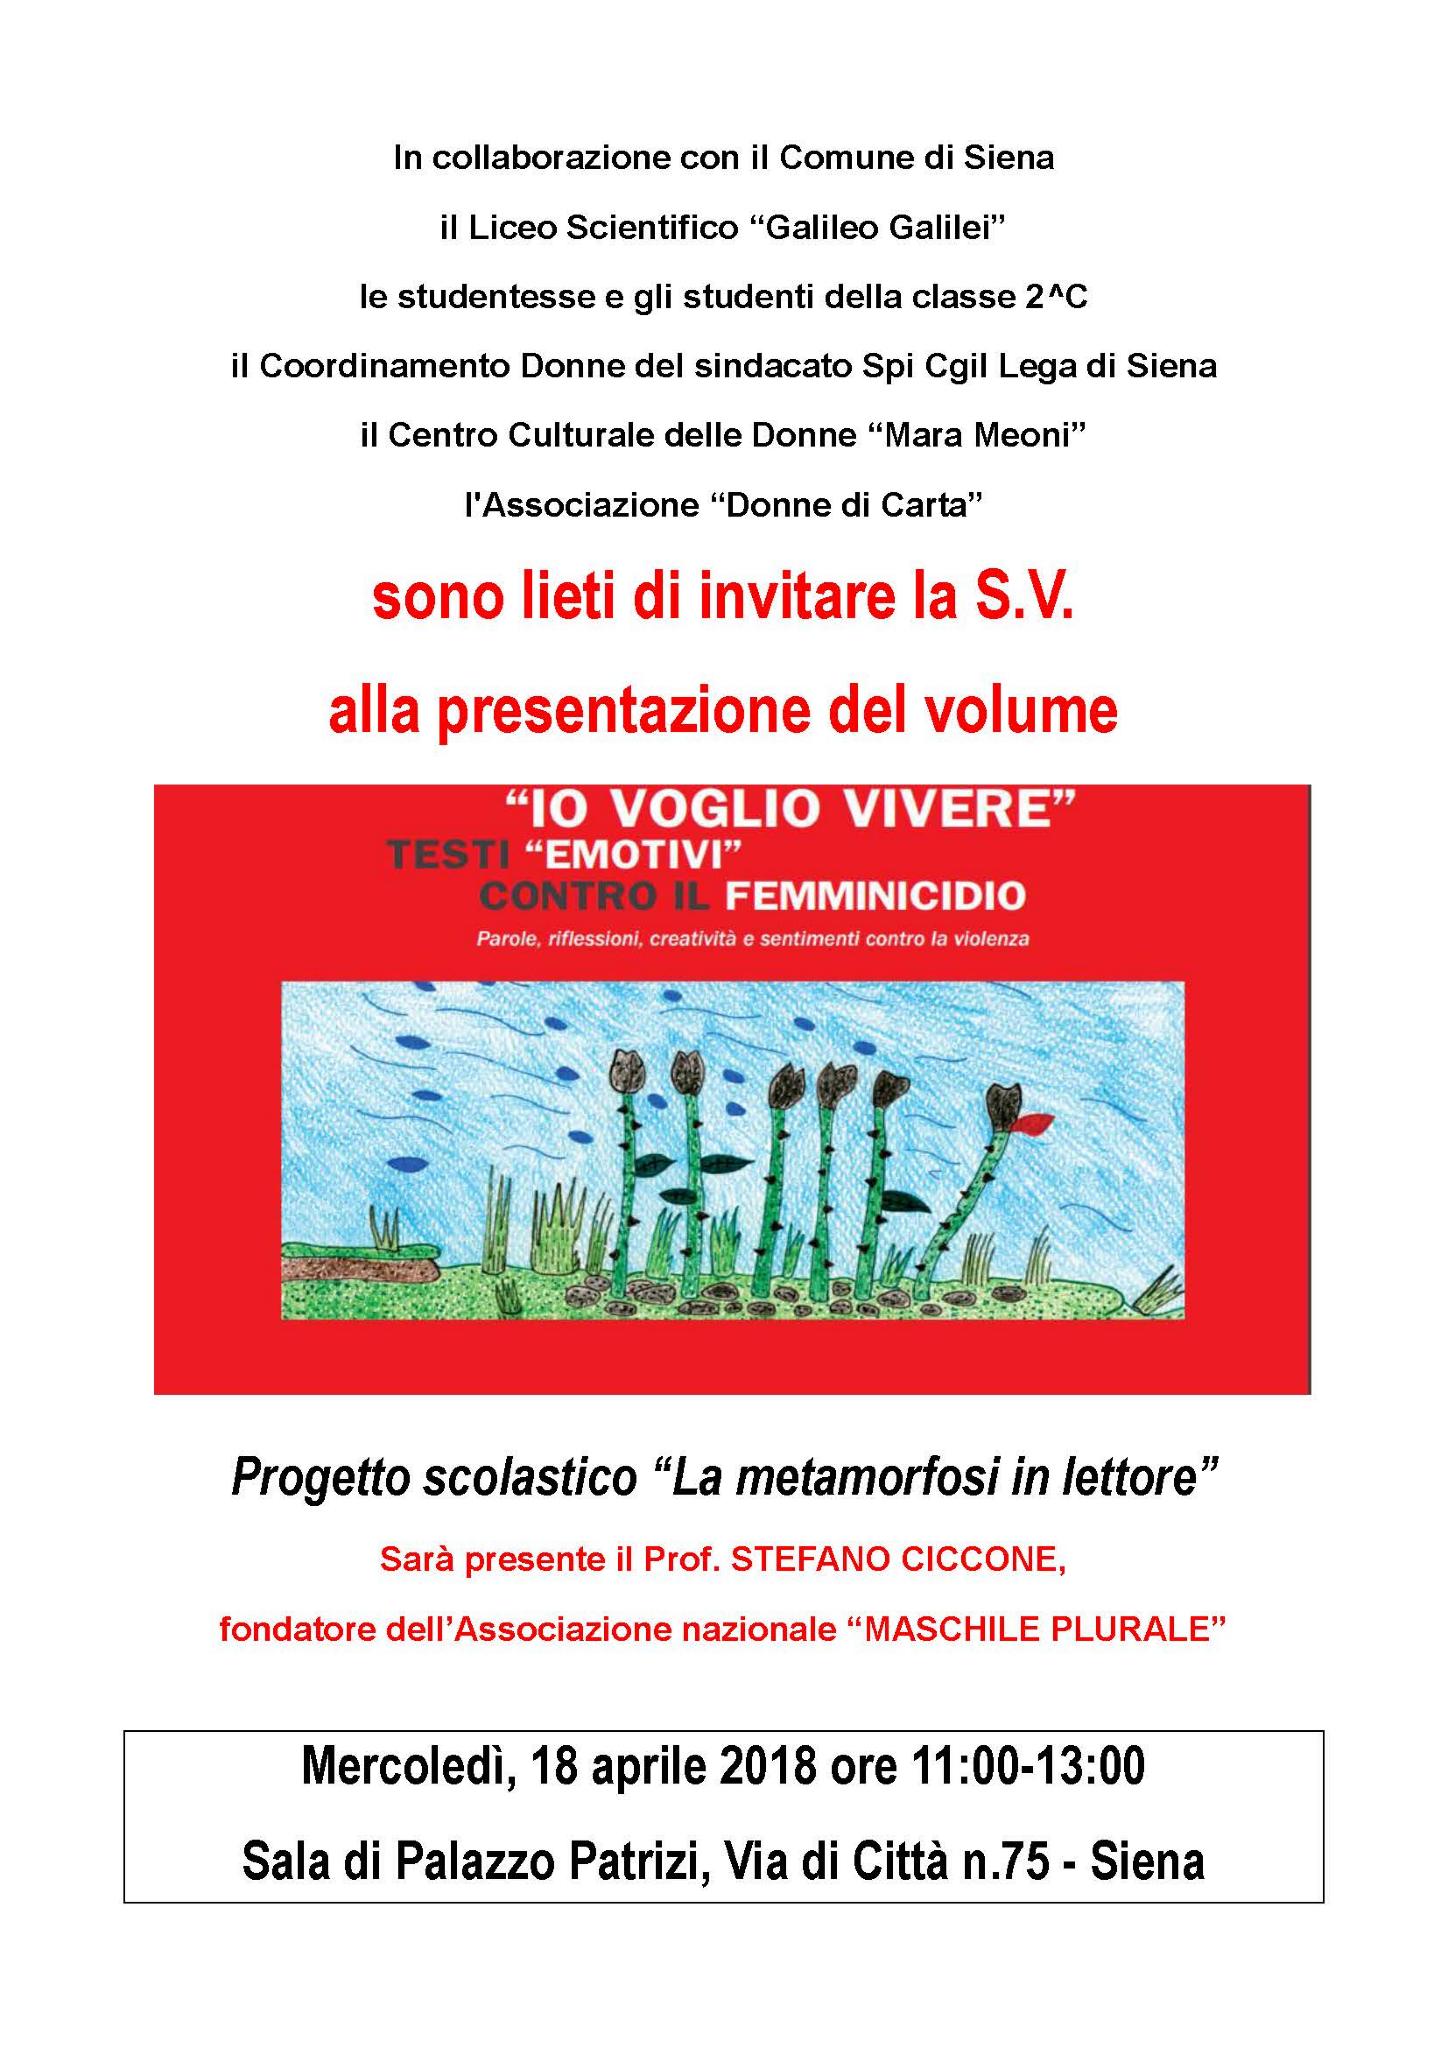 Siena_donne_di_carta_18_aprile